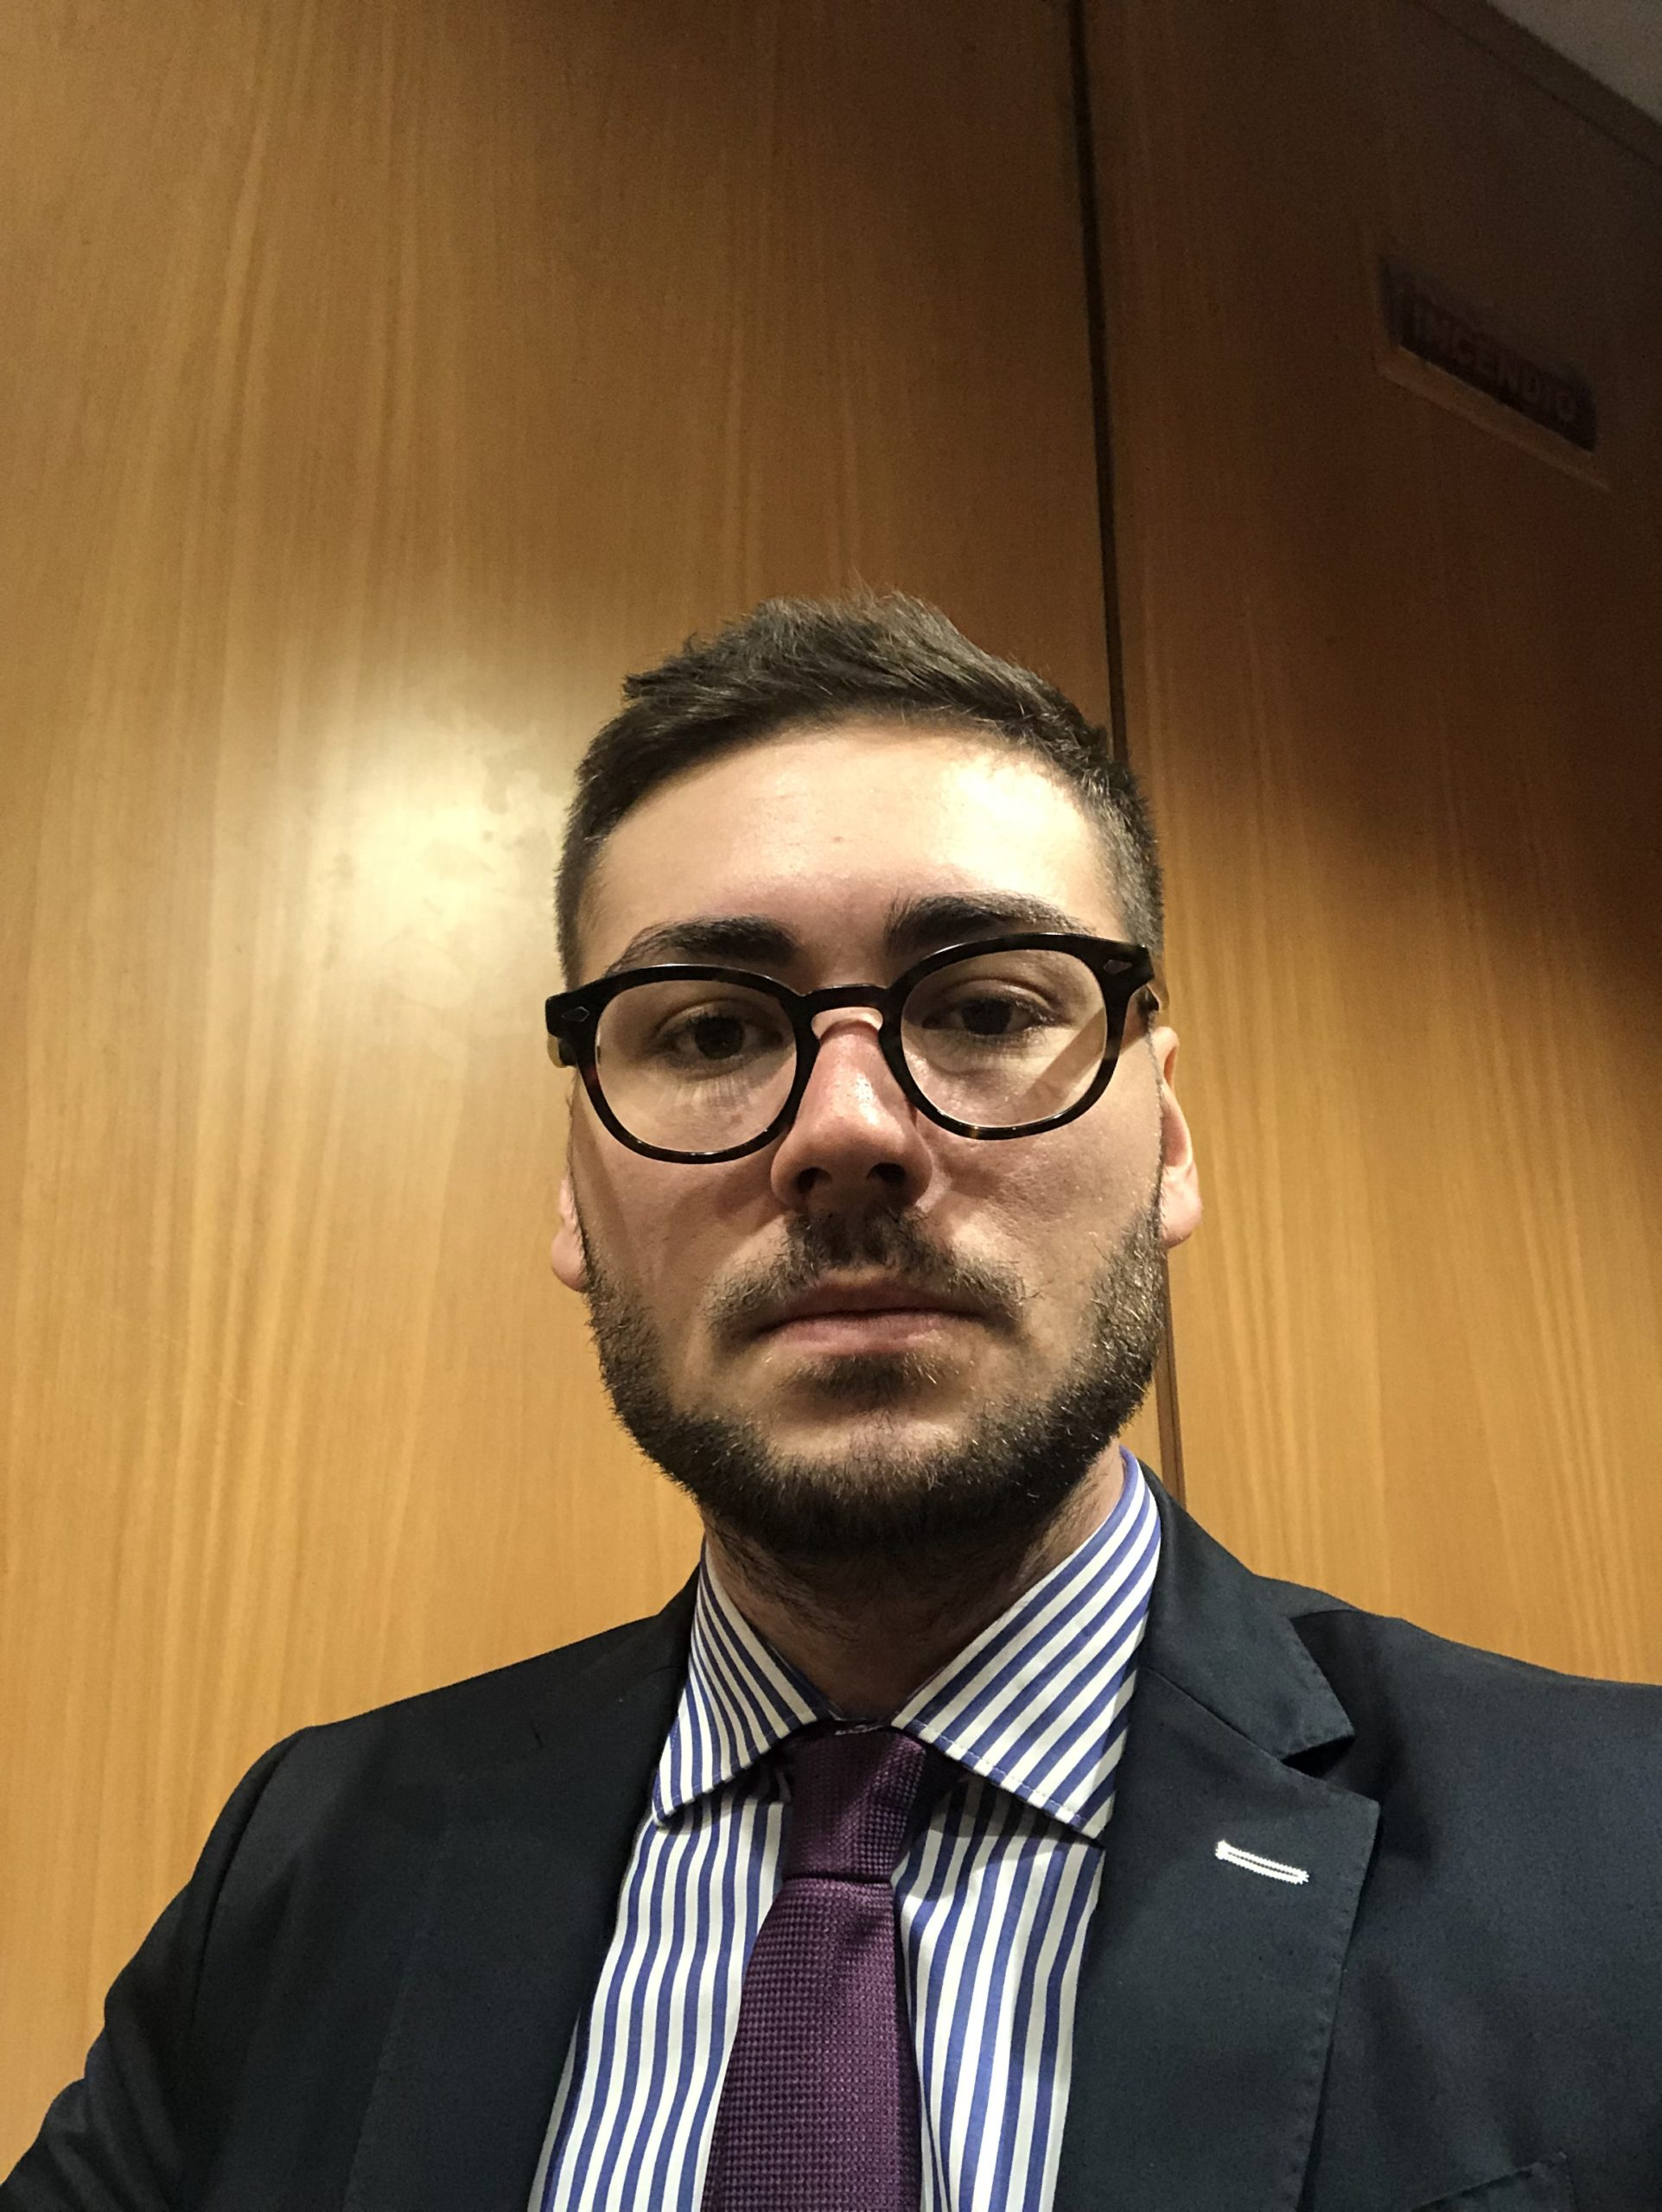 Matteo Macari